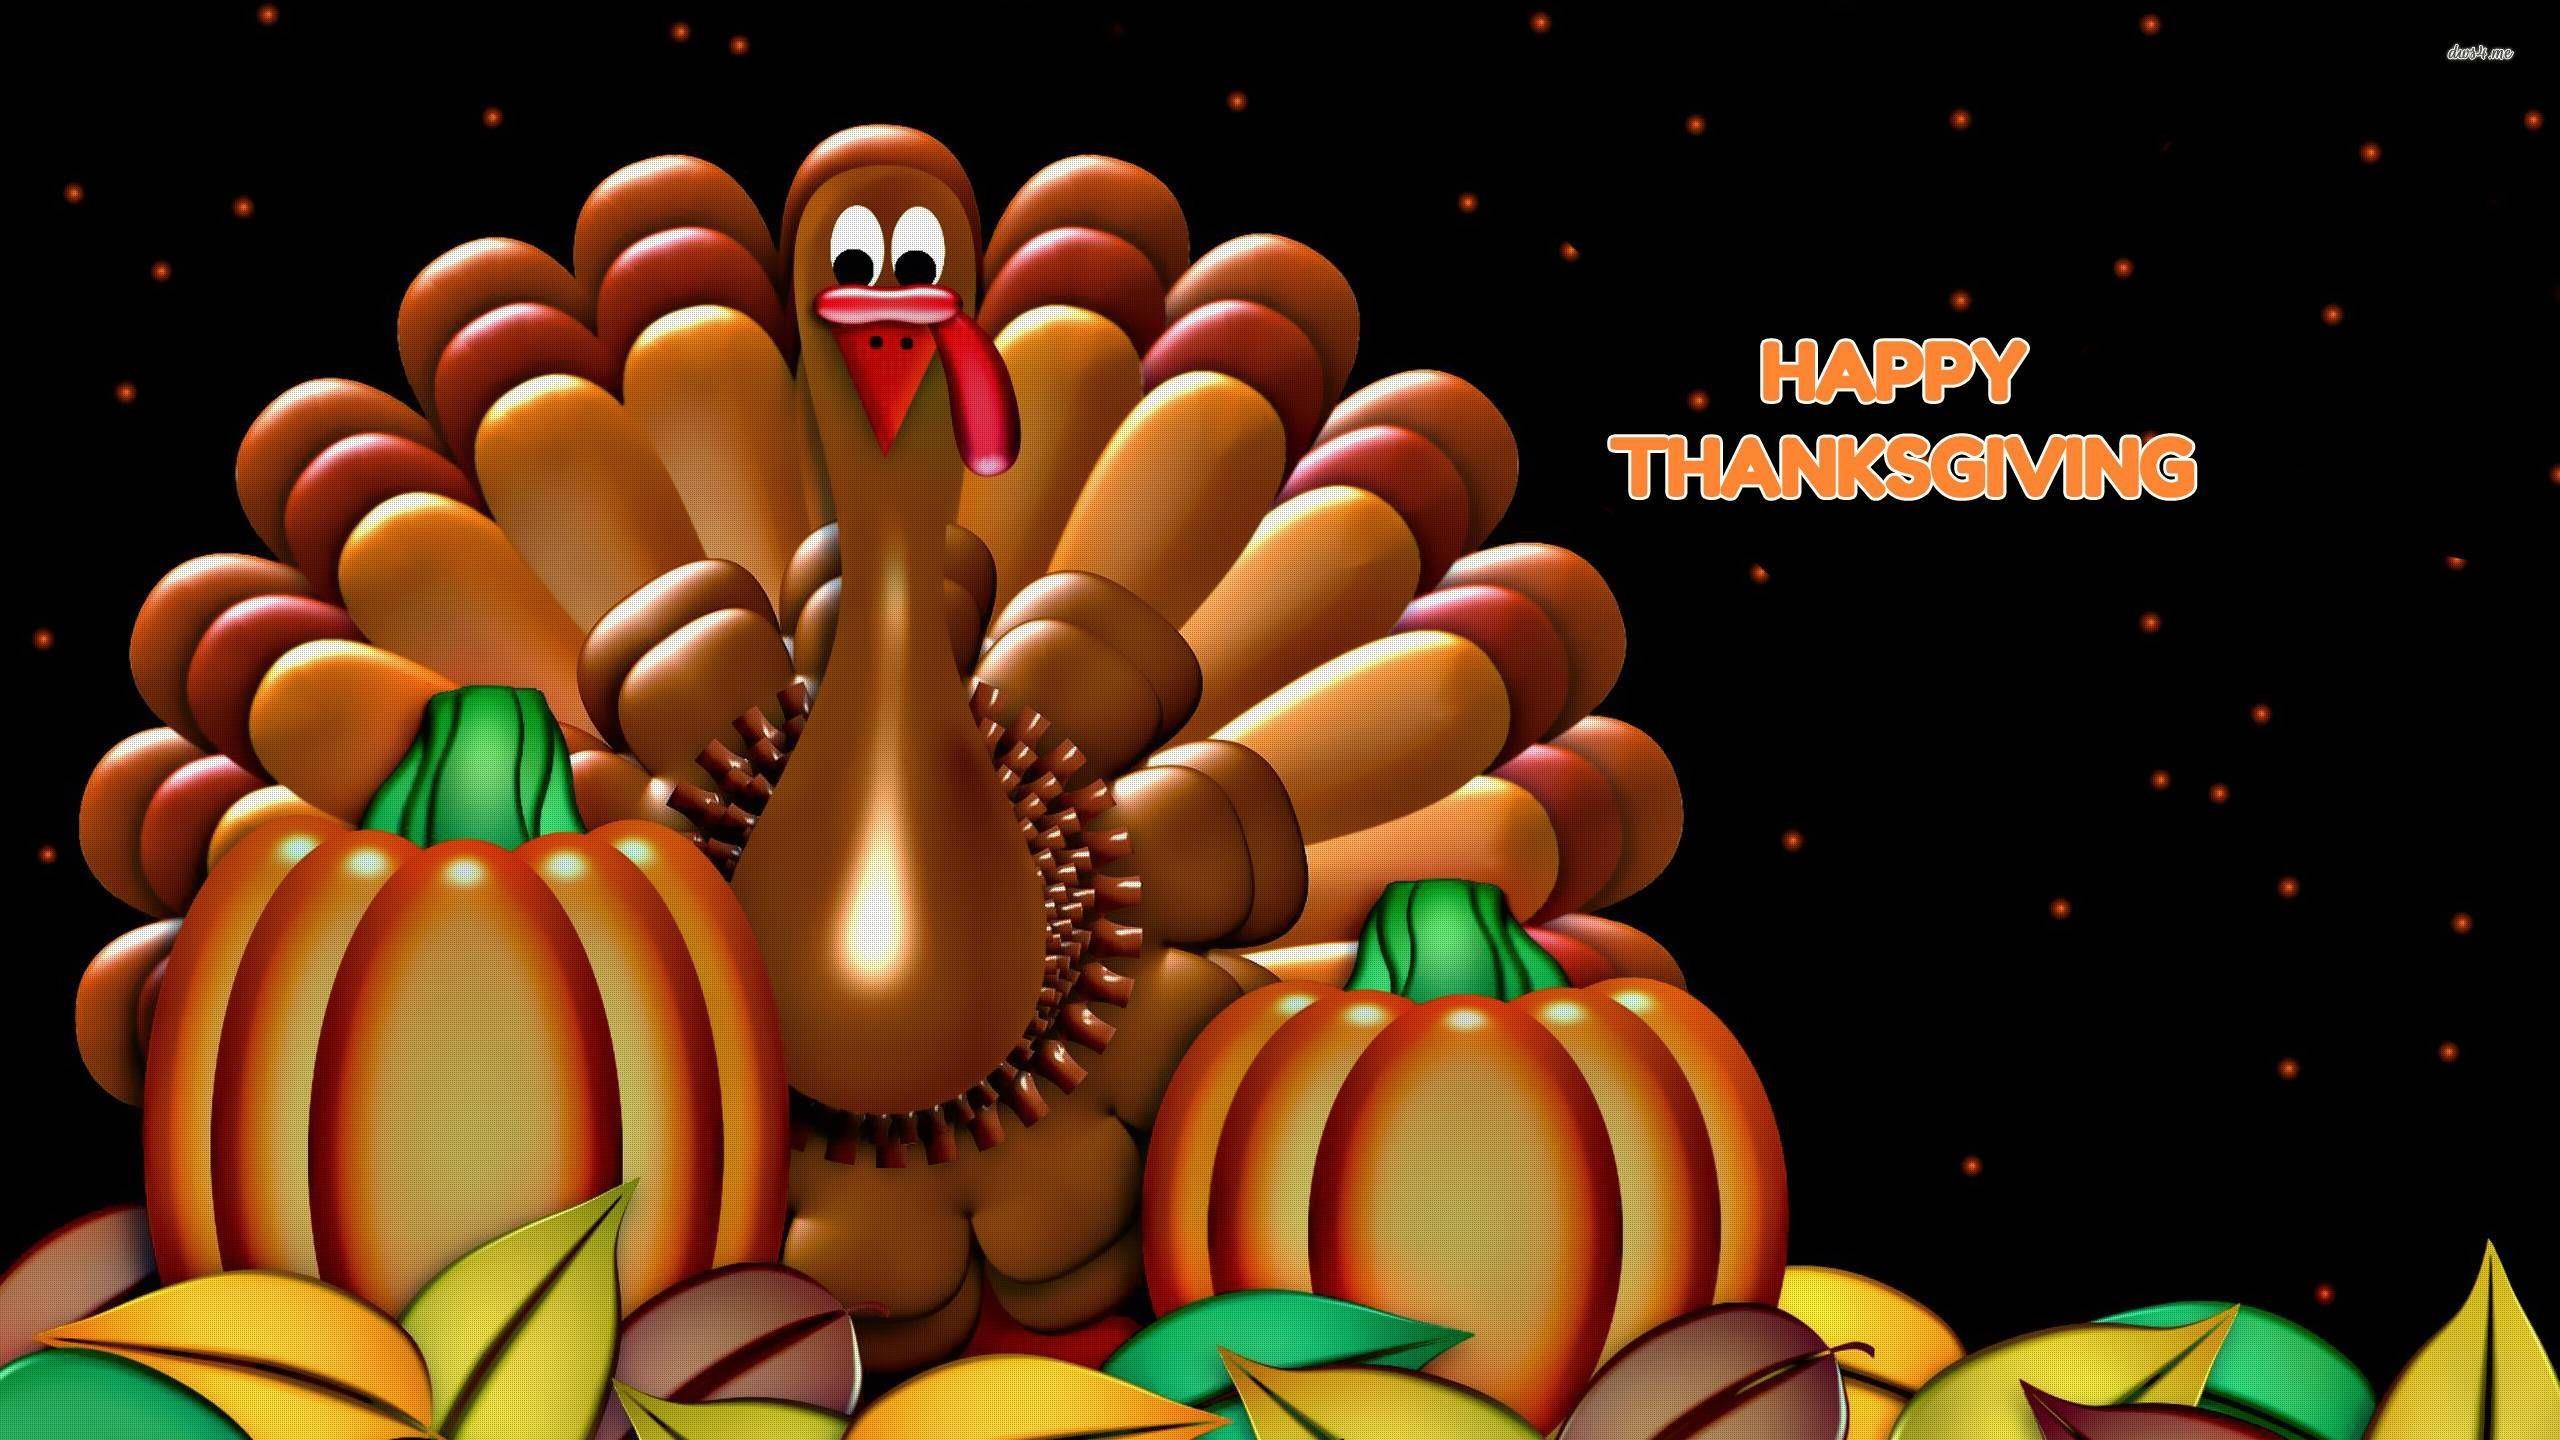 Res: 2560x1440, Free Thanksgiving Wallpaper Desktop Background Â« Long Wallpapers